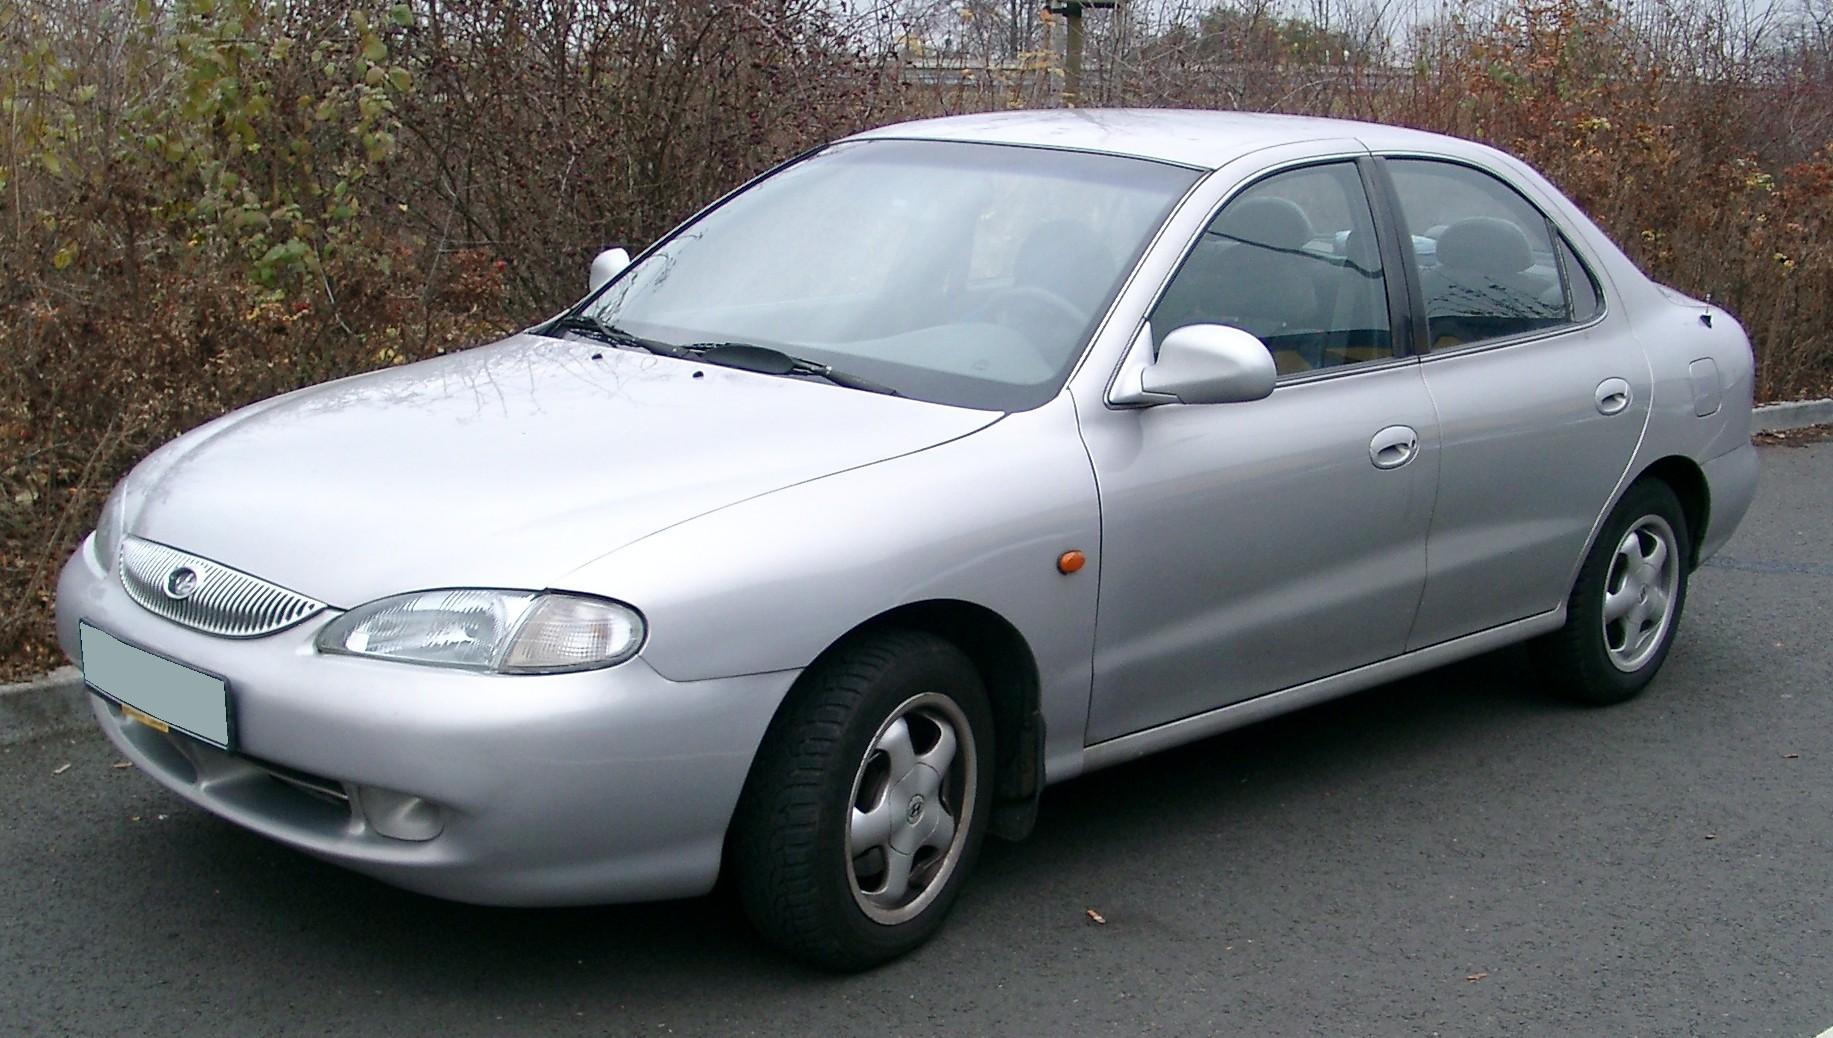 Hyundai Lantra Mileage Cars Online